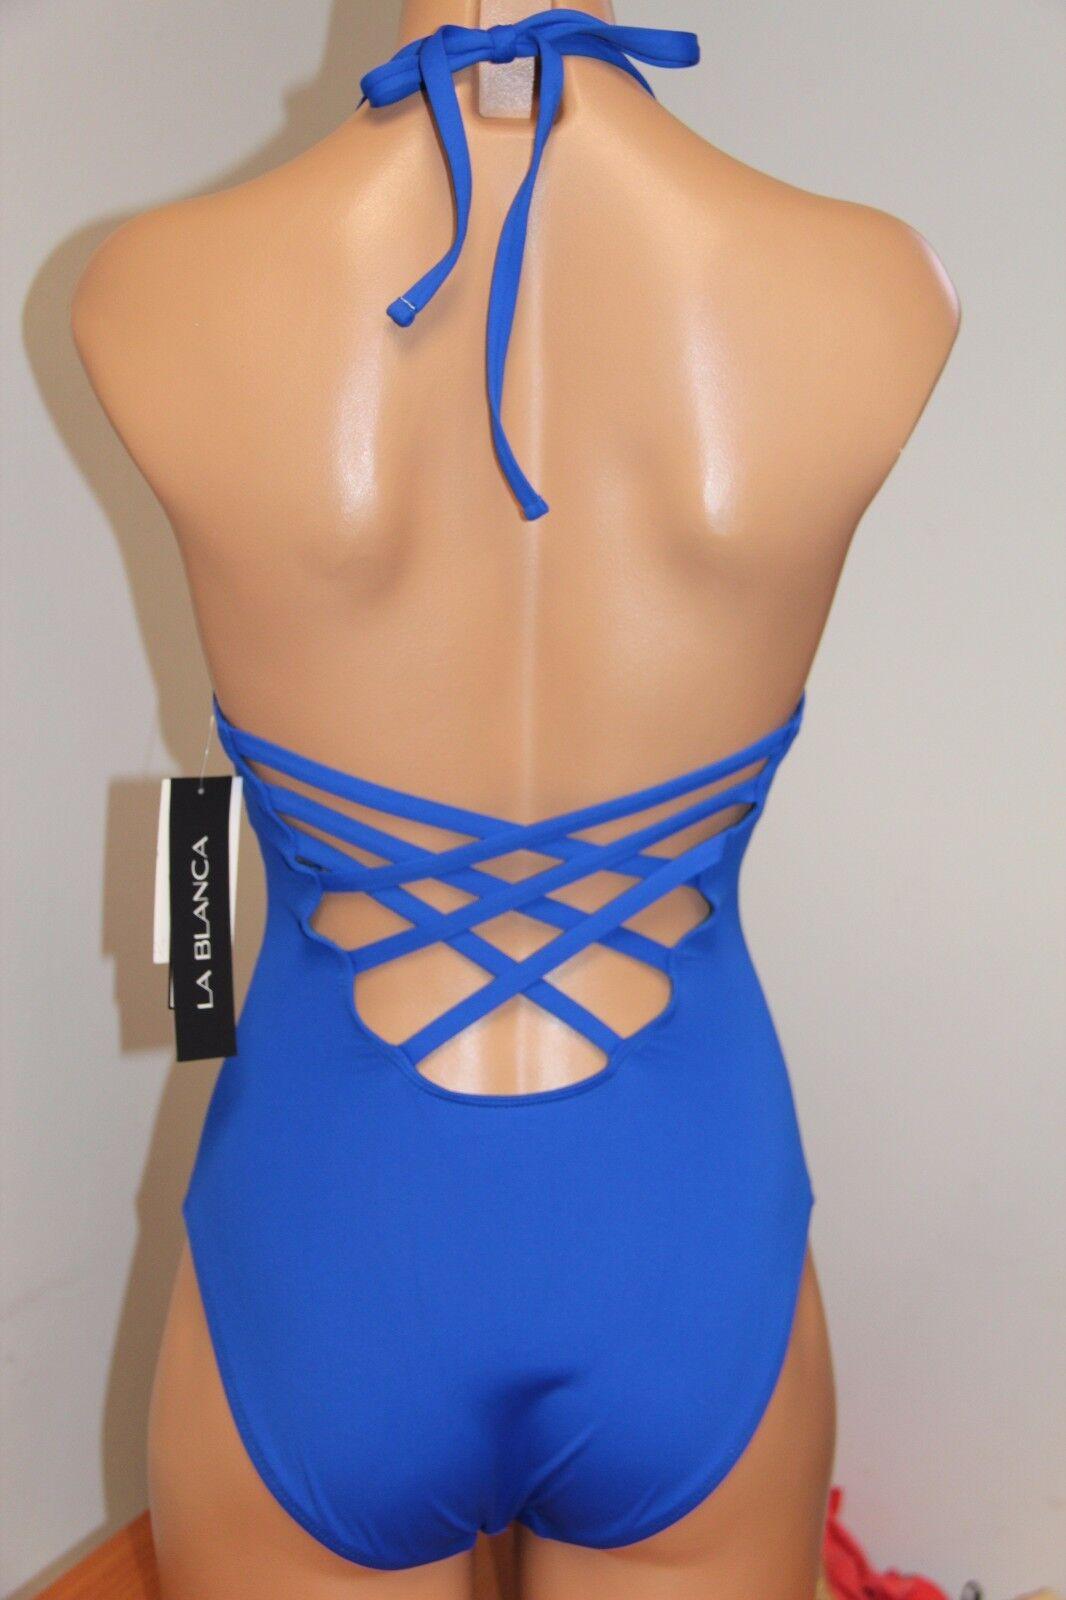 NWT La whitea Swimsuit Swimsuit Swimsuit Bikini 1 one piece Sz 4 Sapphire SAP 090c4a